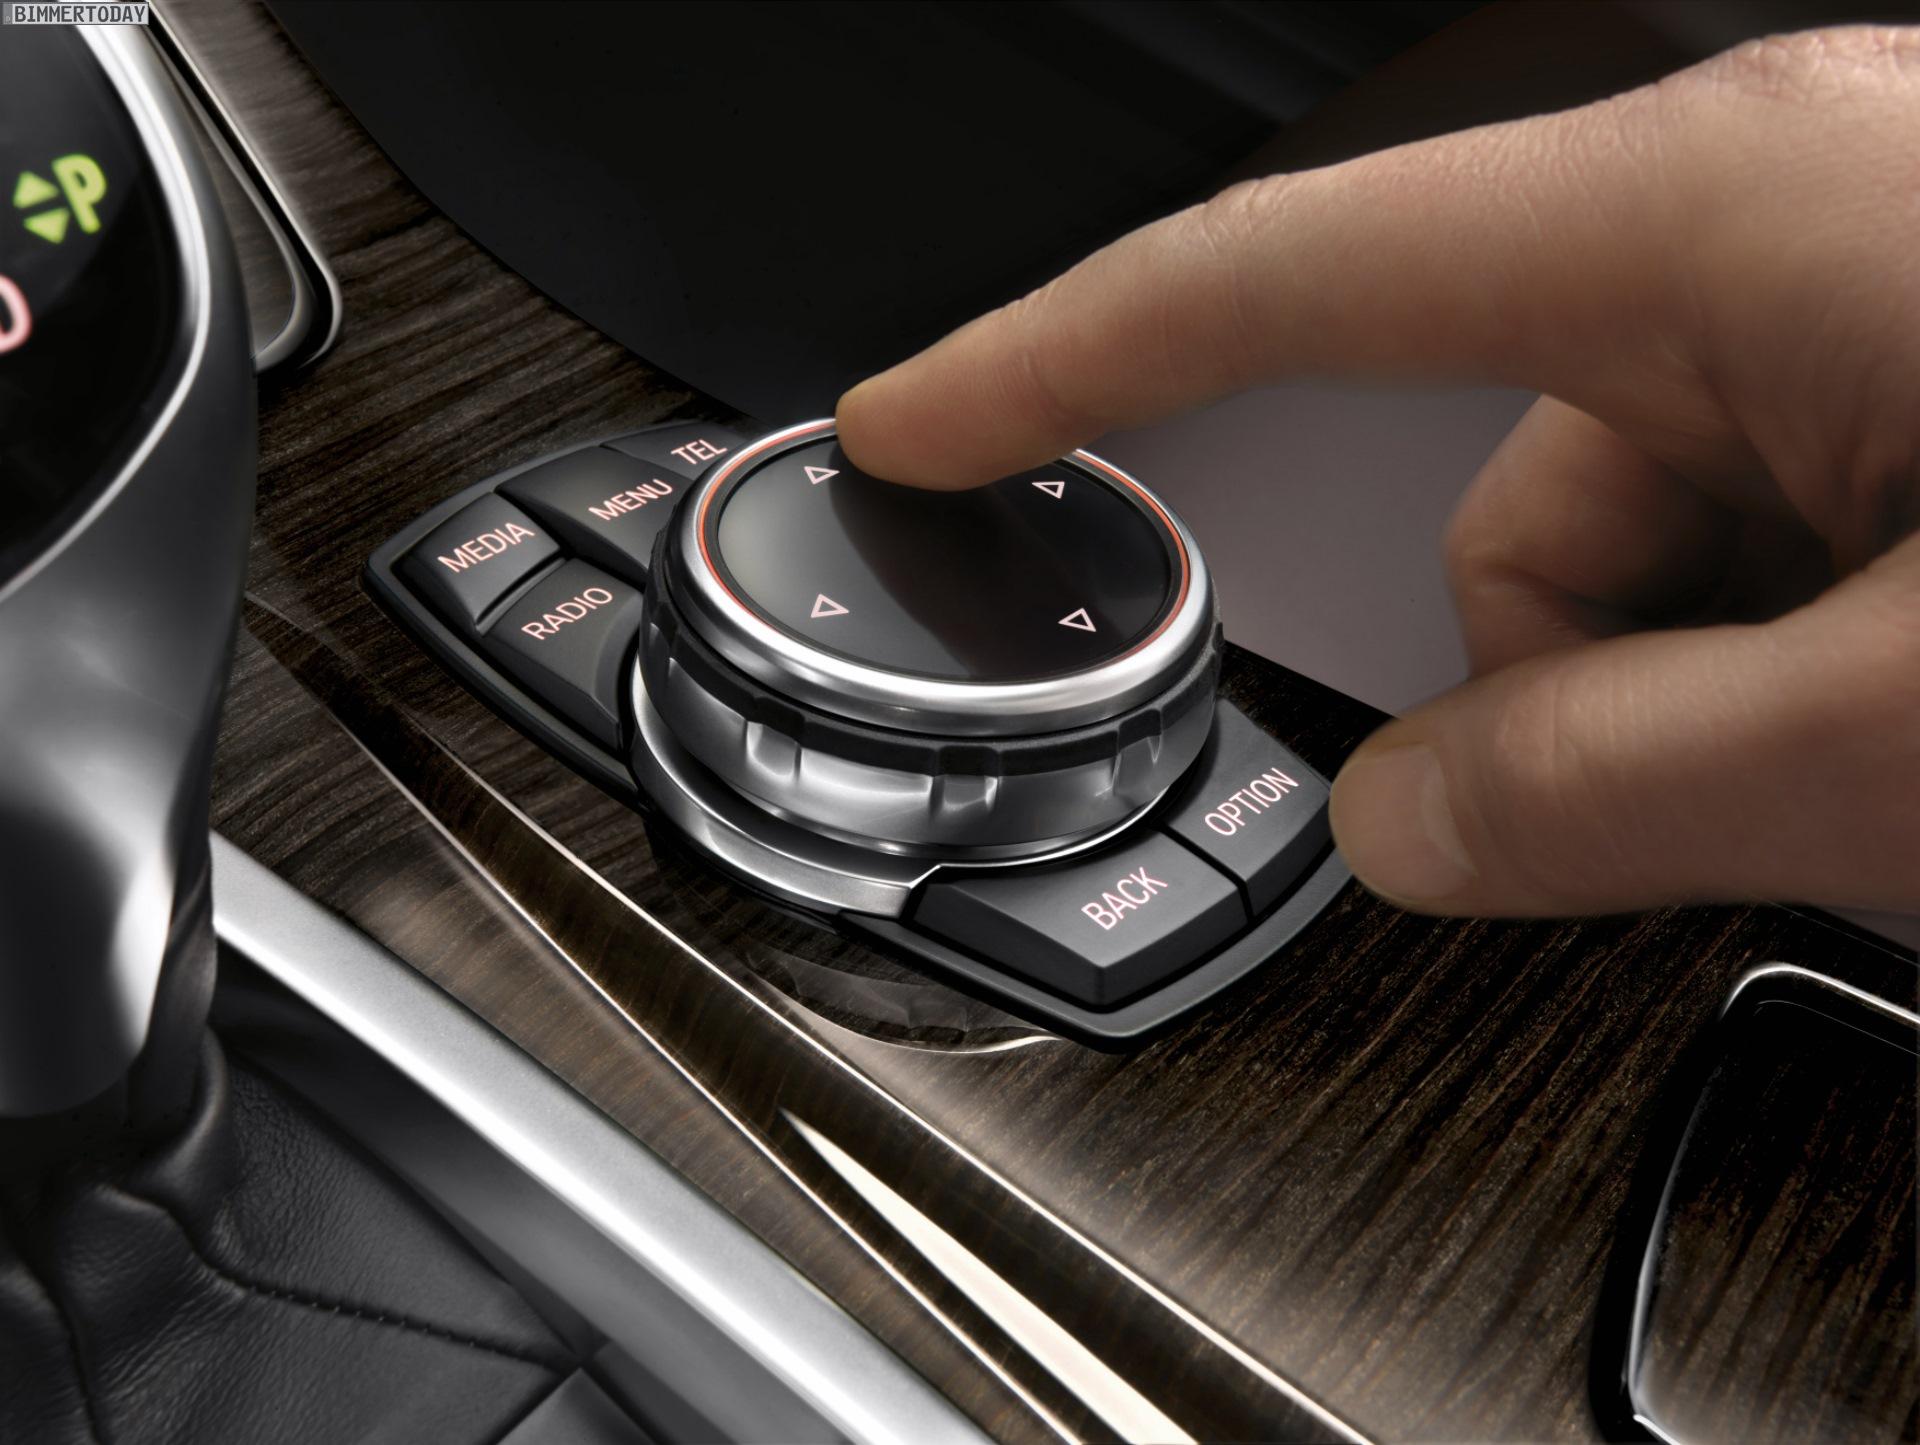 bmw idrive touch controller 2013 neue funktionen im video. Black Bedroom Furniture Sets. Home Design Ideas